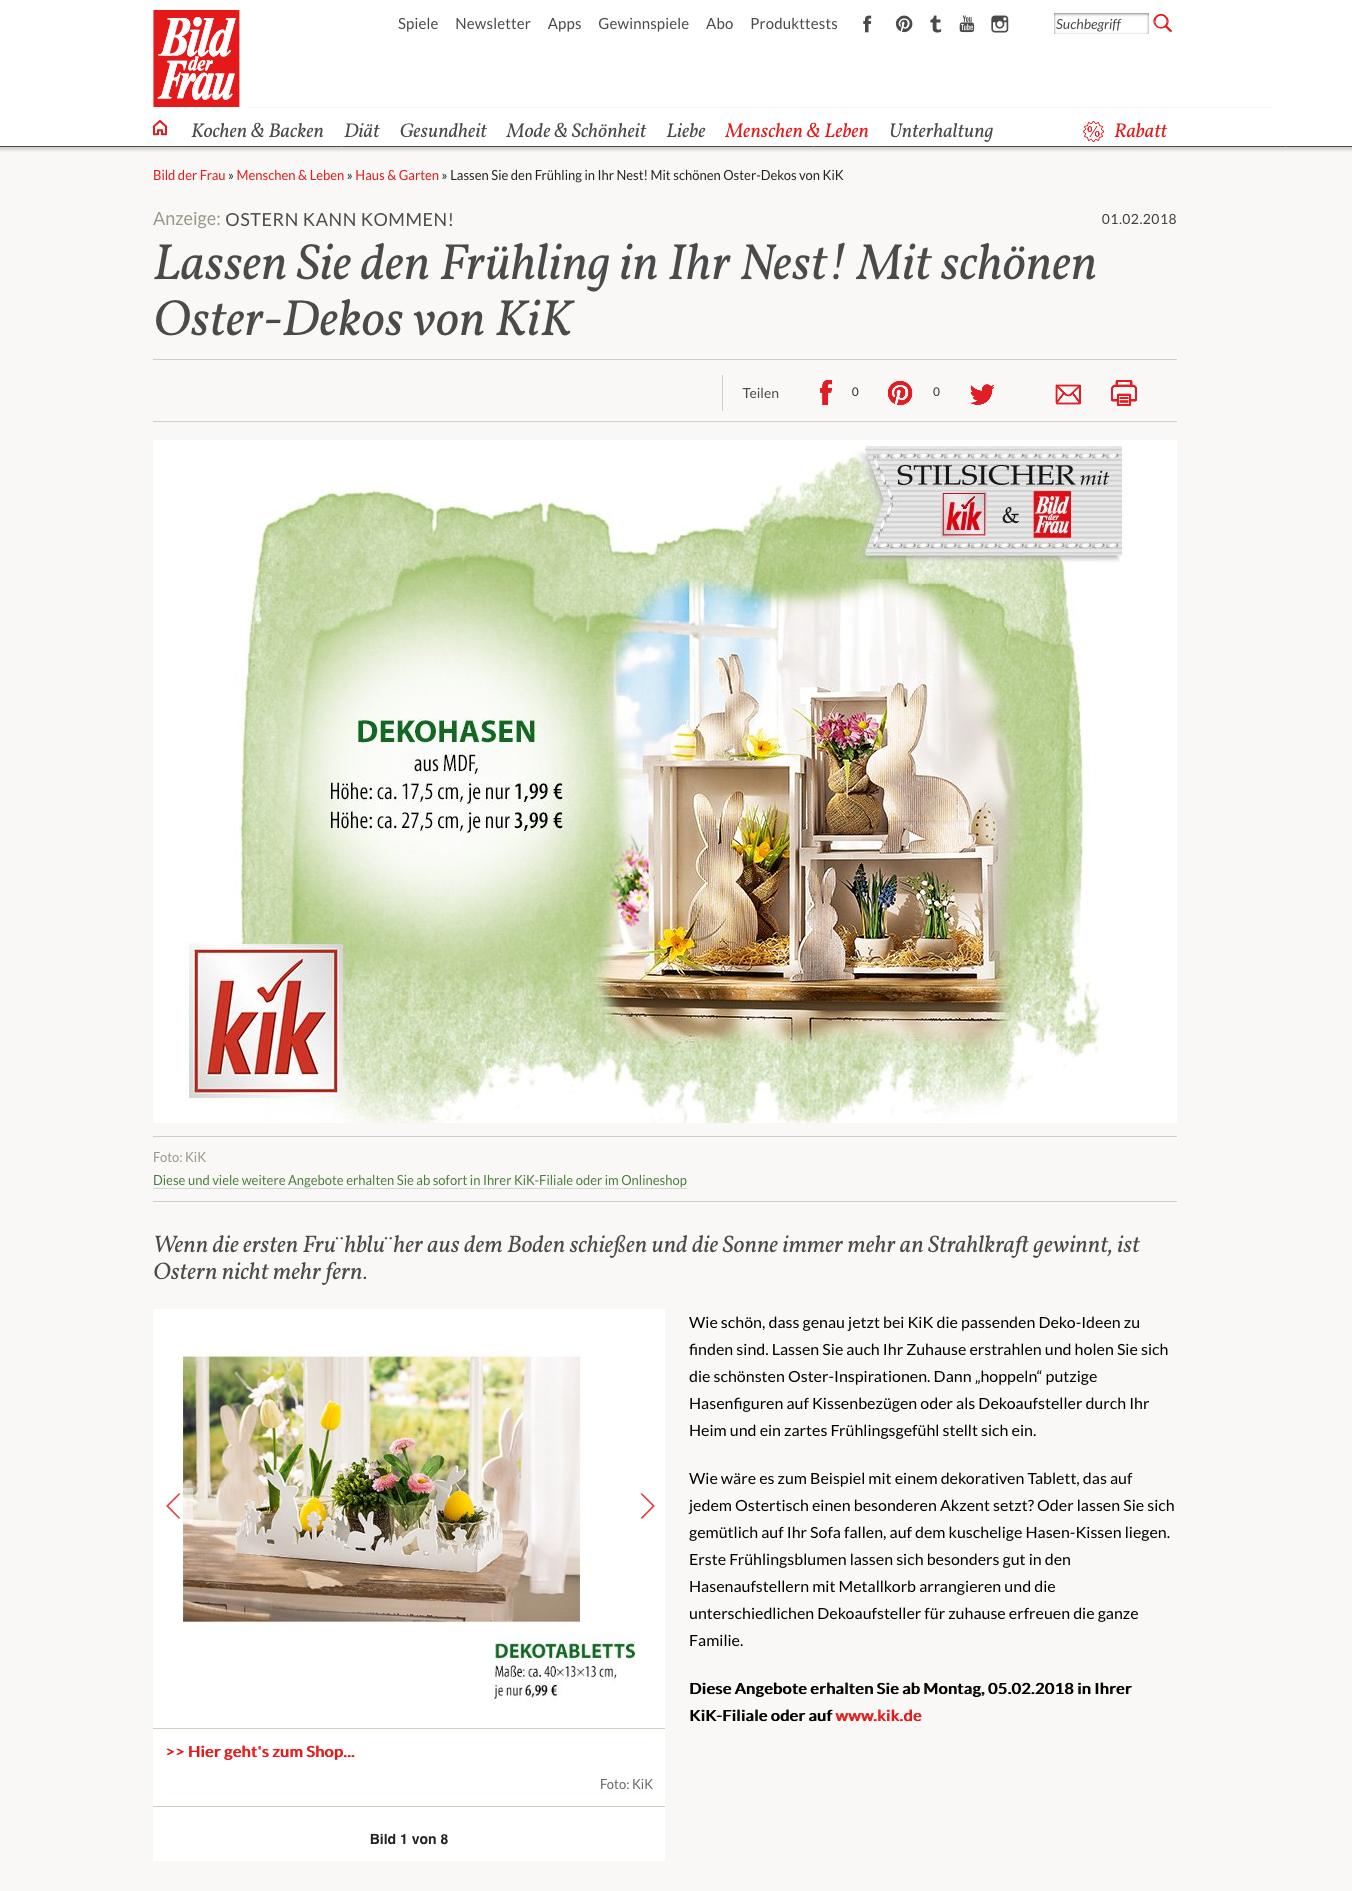 KiK Online-Advertorial auf bildderfrau.de